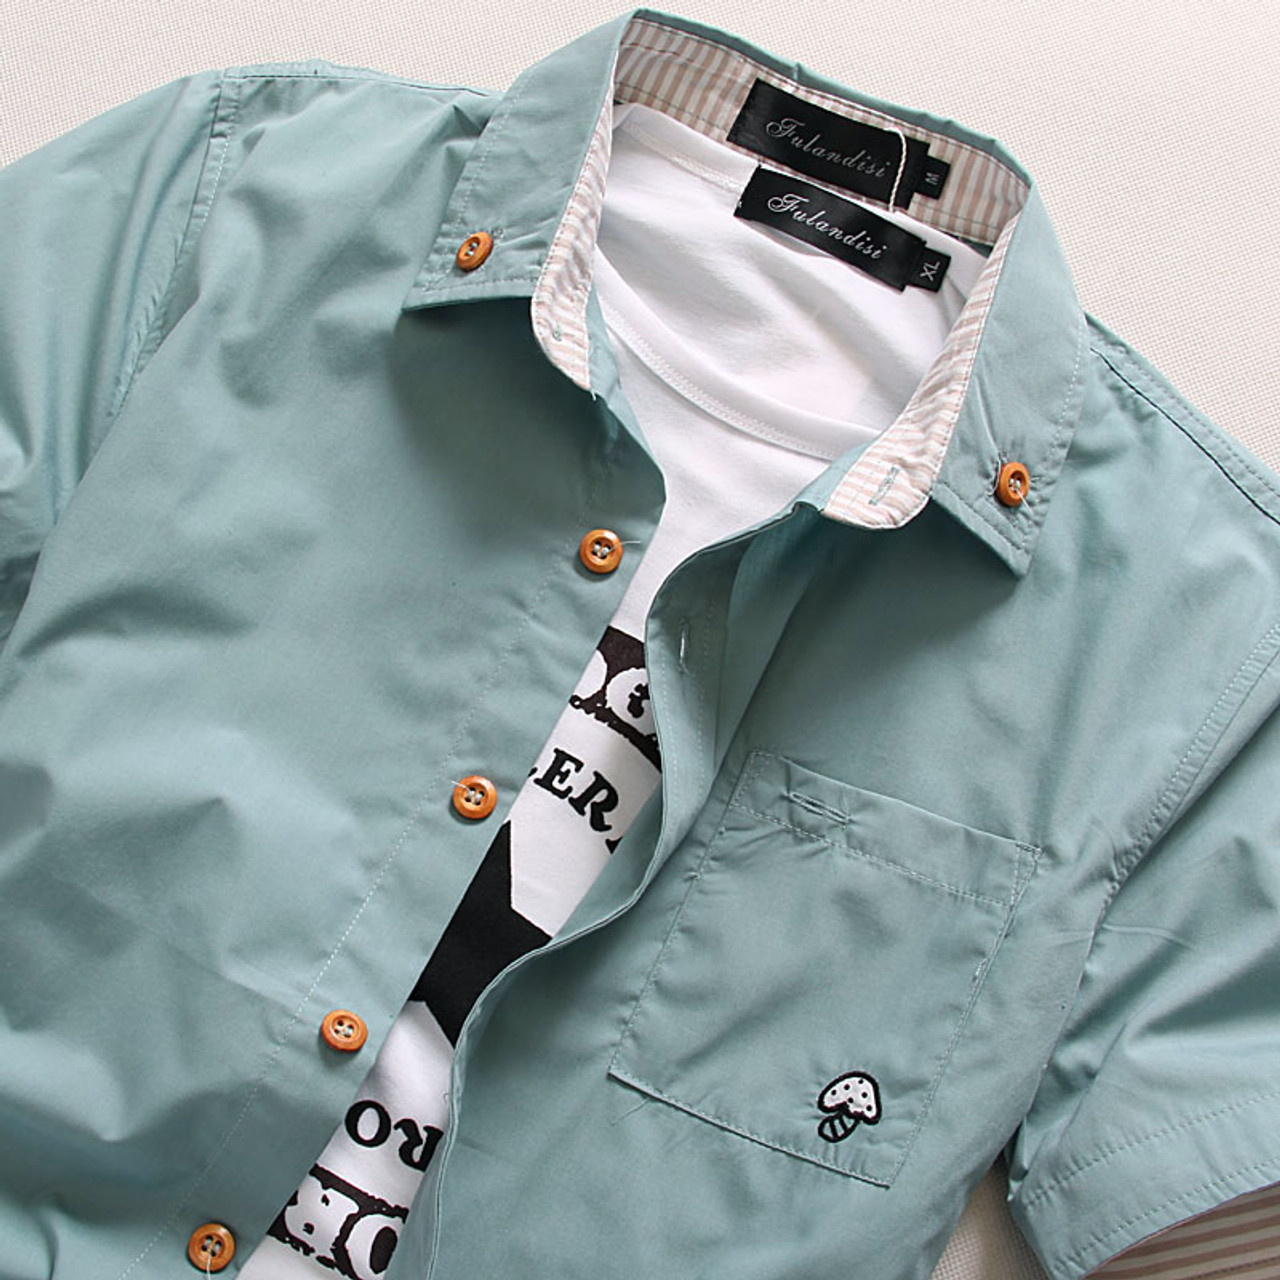 b1d7f268da3 ... MarKyi plus size 5xl mushroom embroidery mens short sleeve casual shirts  fashion 2017 new summer cotton ...